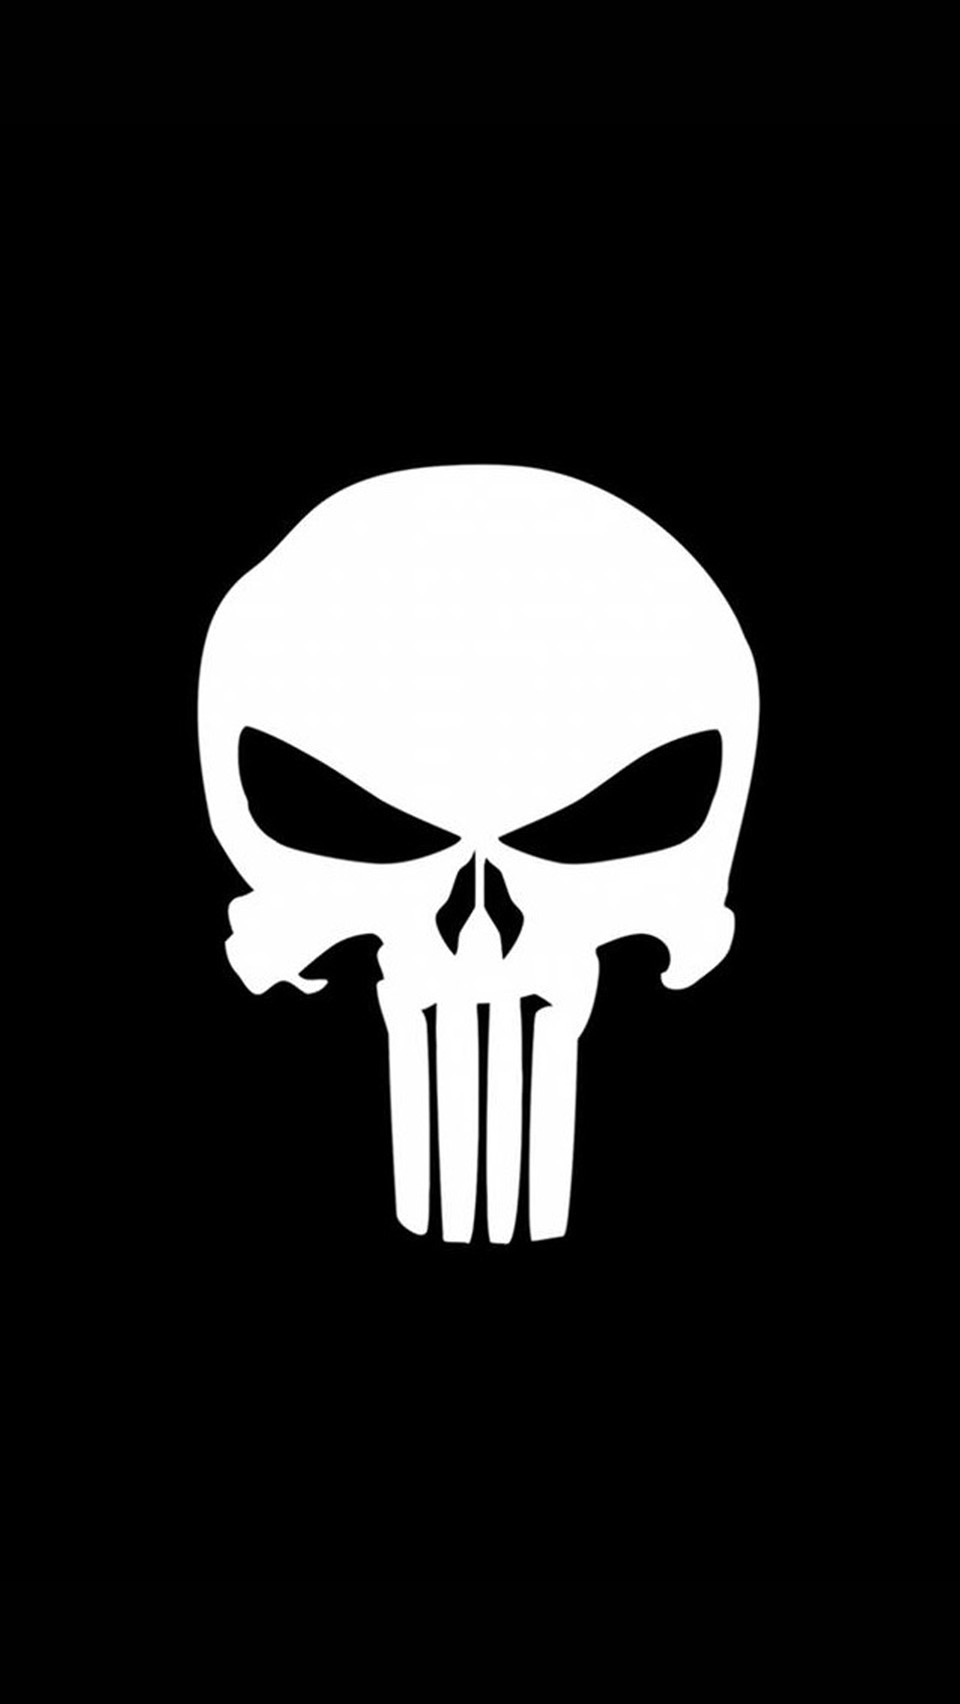 Skull Iphone 6 Wallpaper Punisher Logo photos of Iphone Wallpaper Size 960x1704